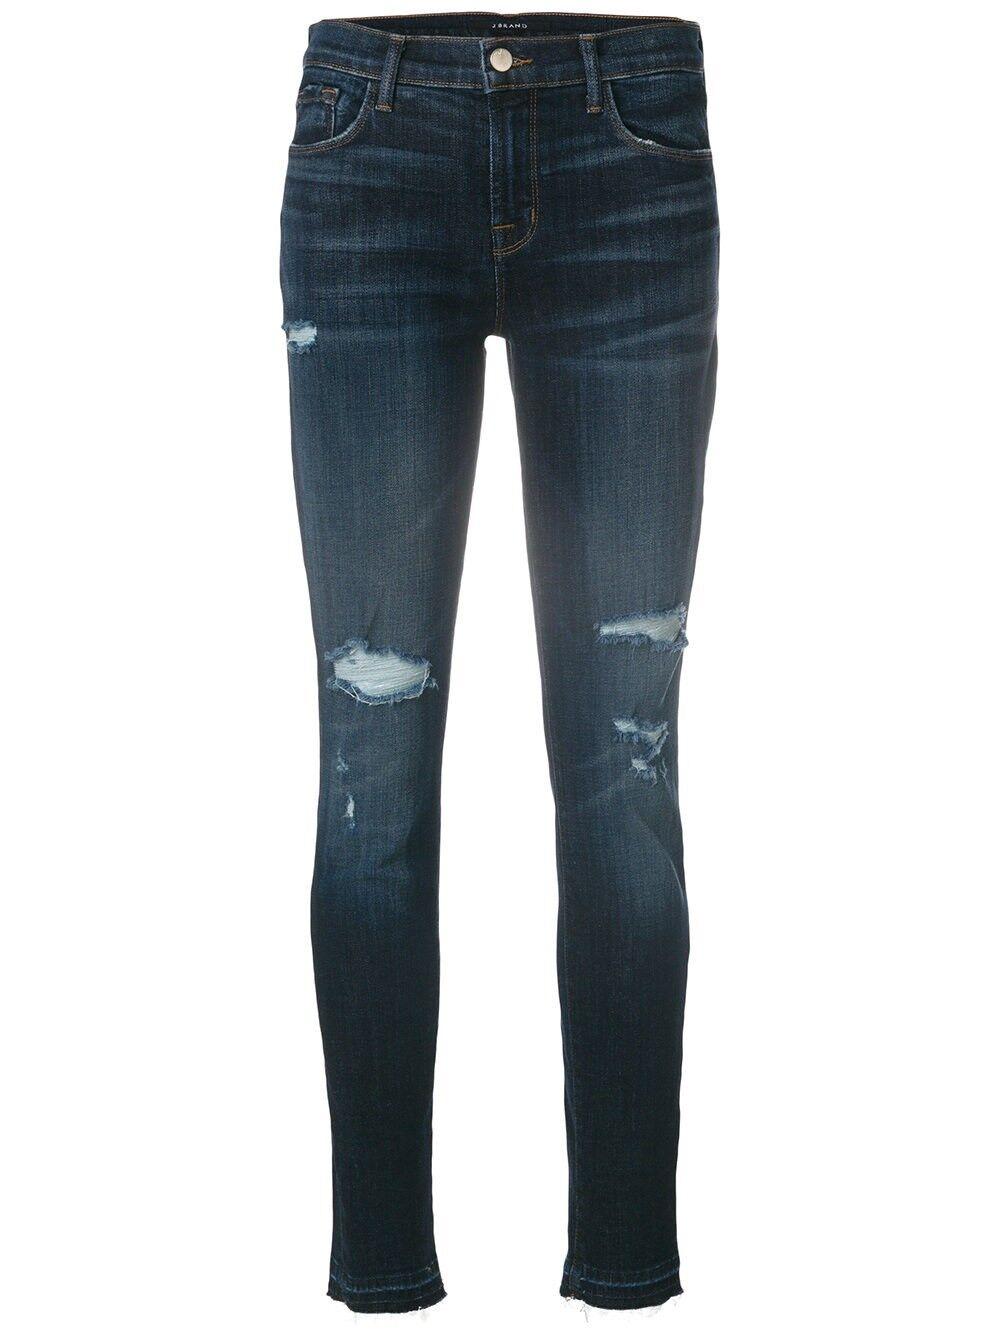 New J Brand Jeans mid rise destroyed denim Super Skinny Legging Jeggings Pants